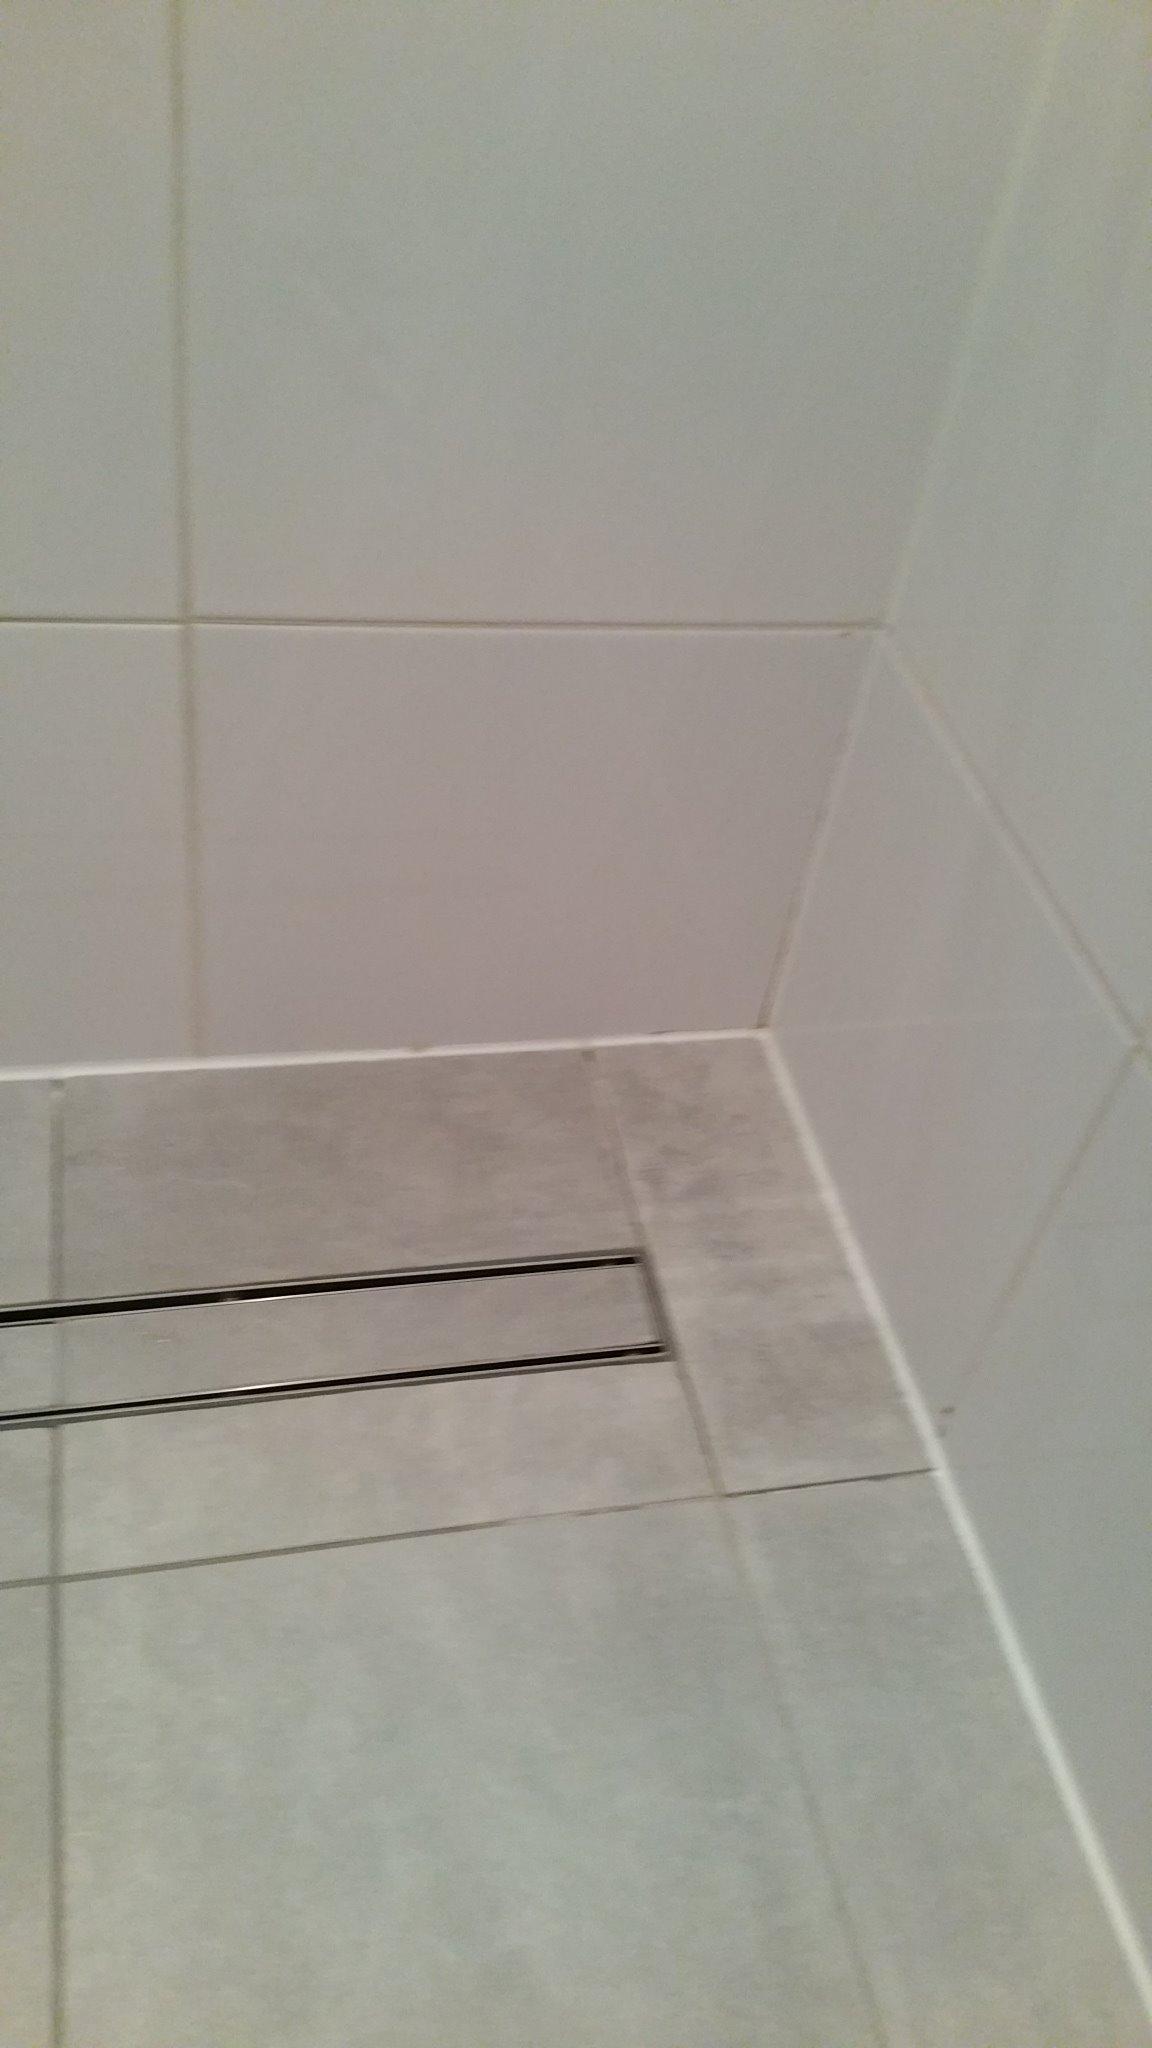 Voegwerk vloertegels en wandtegels badkamer deels opnieuw werkspot - Badkamer lengte plan ...